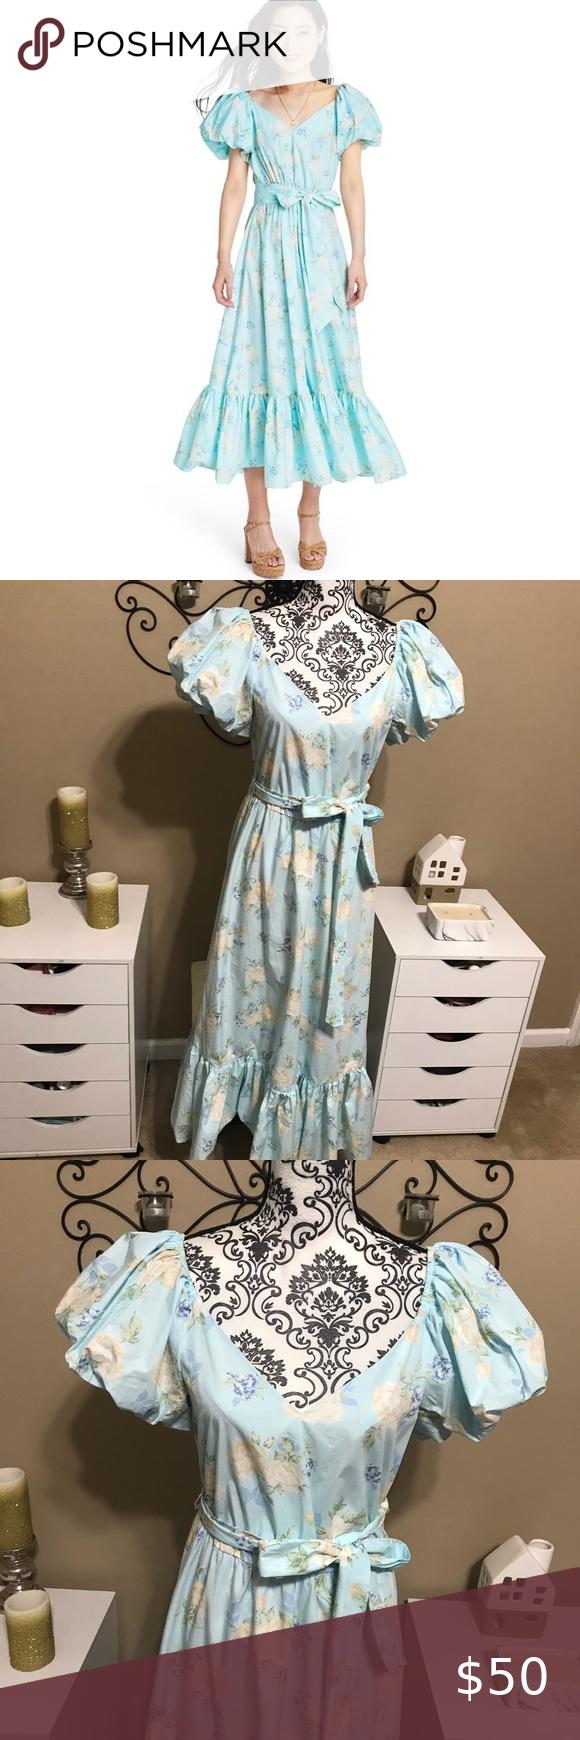 Loveshackfancy Target Estelle Midi Dress 2 Nwt Midi Dress Dresses Loveshackfancy [ 1740 x 580 Pixel ]